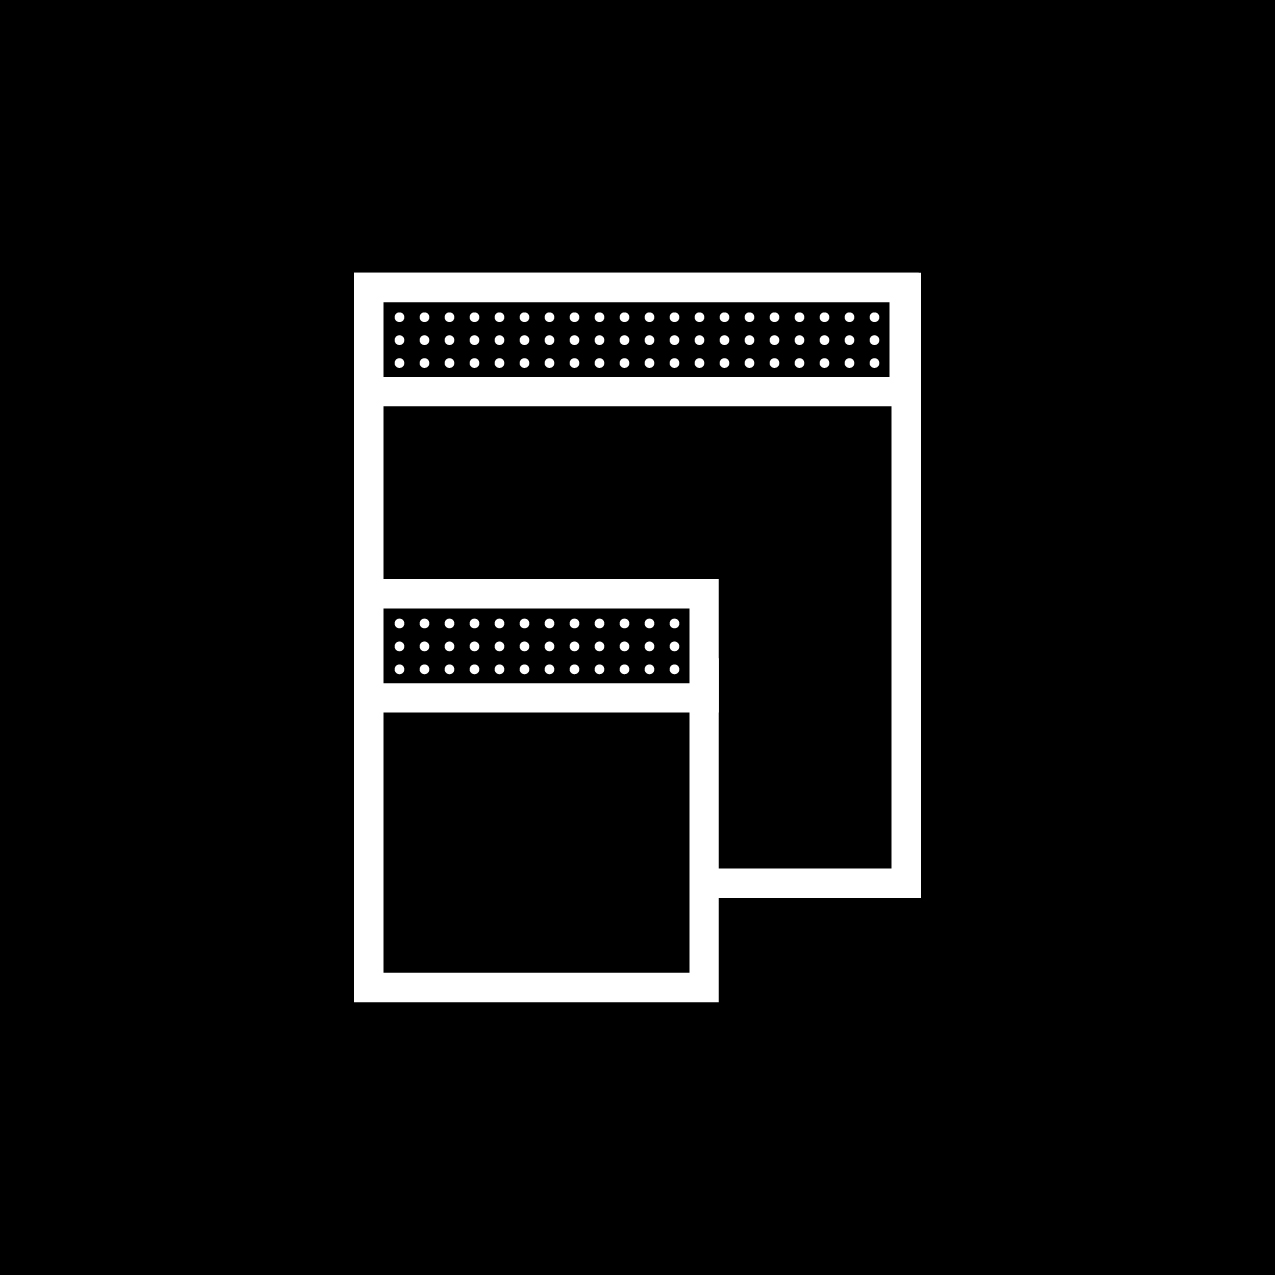 Letter F4 design by Furia